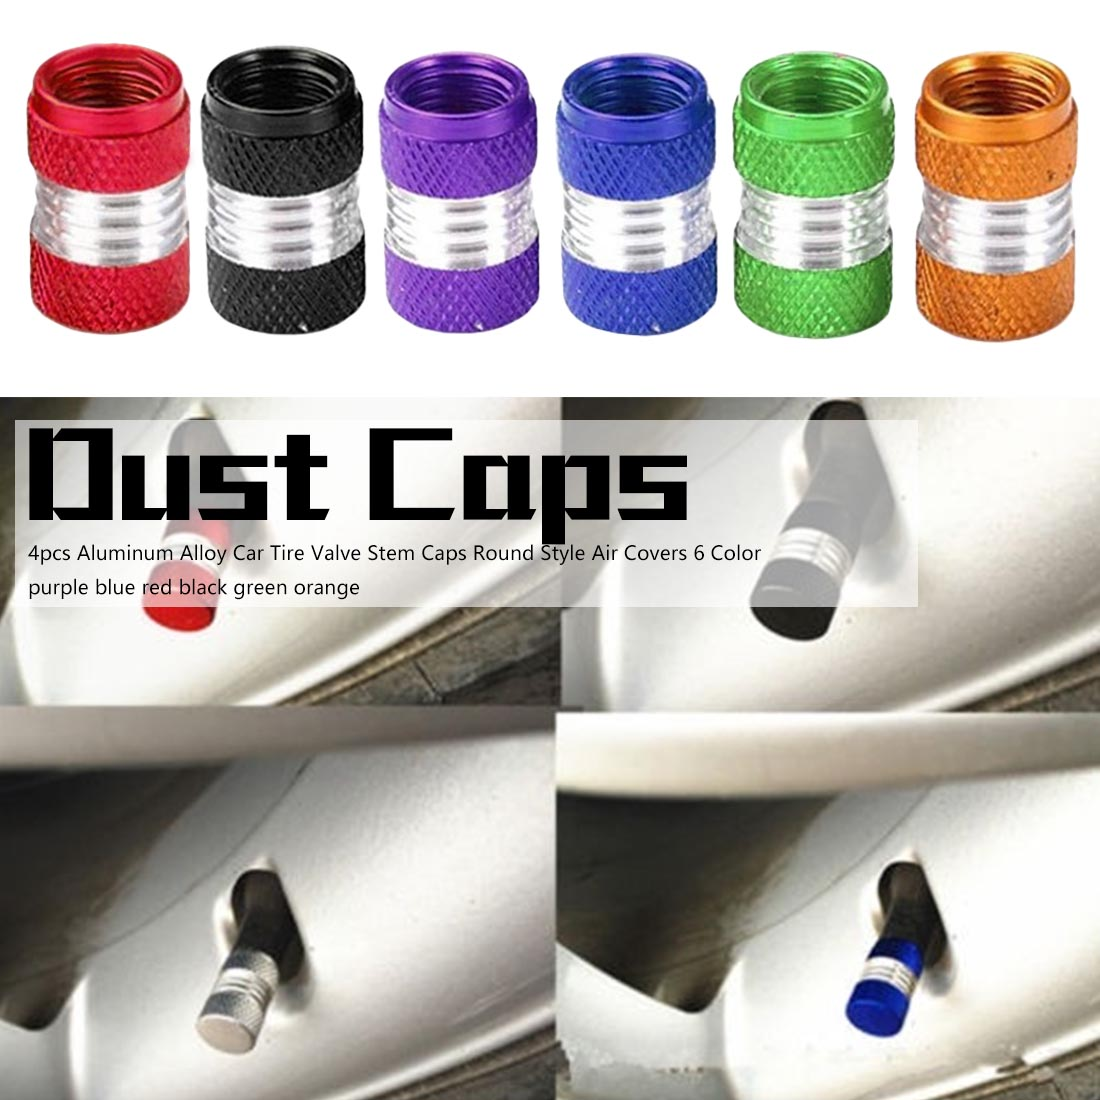 6 Color 4Pcs Aluminum Alloy Car Truck Round Wheel Tire Valve Stem Cap Dust Cover Black/Red/Yellow/Green/Blue/Purple